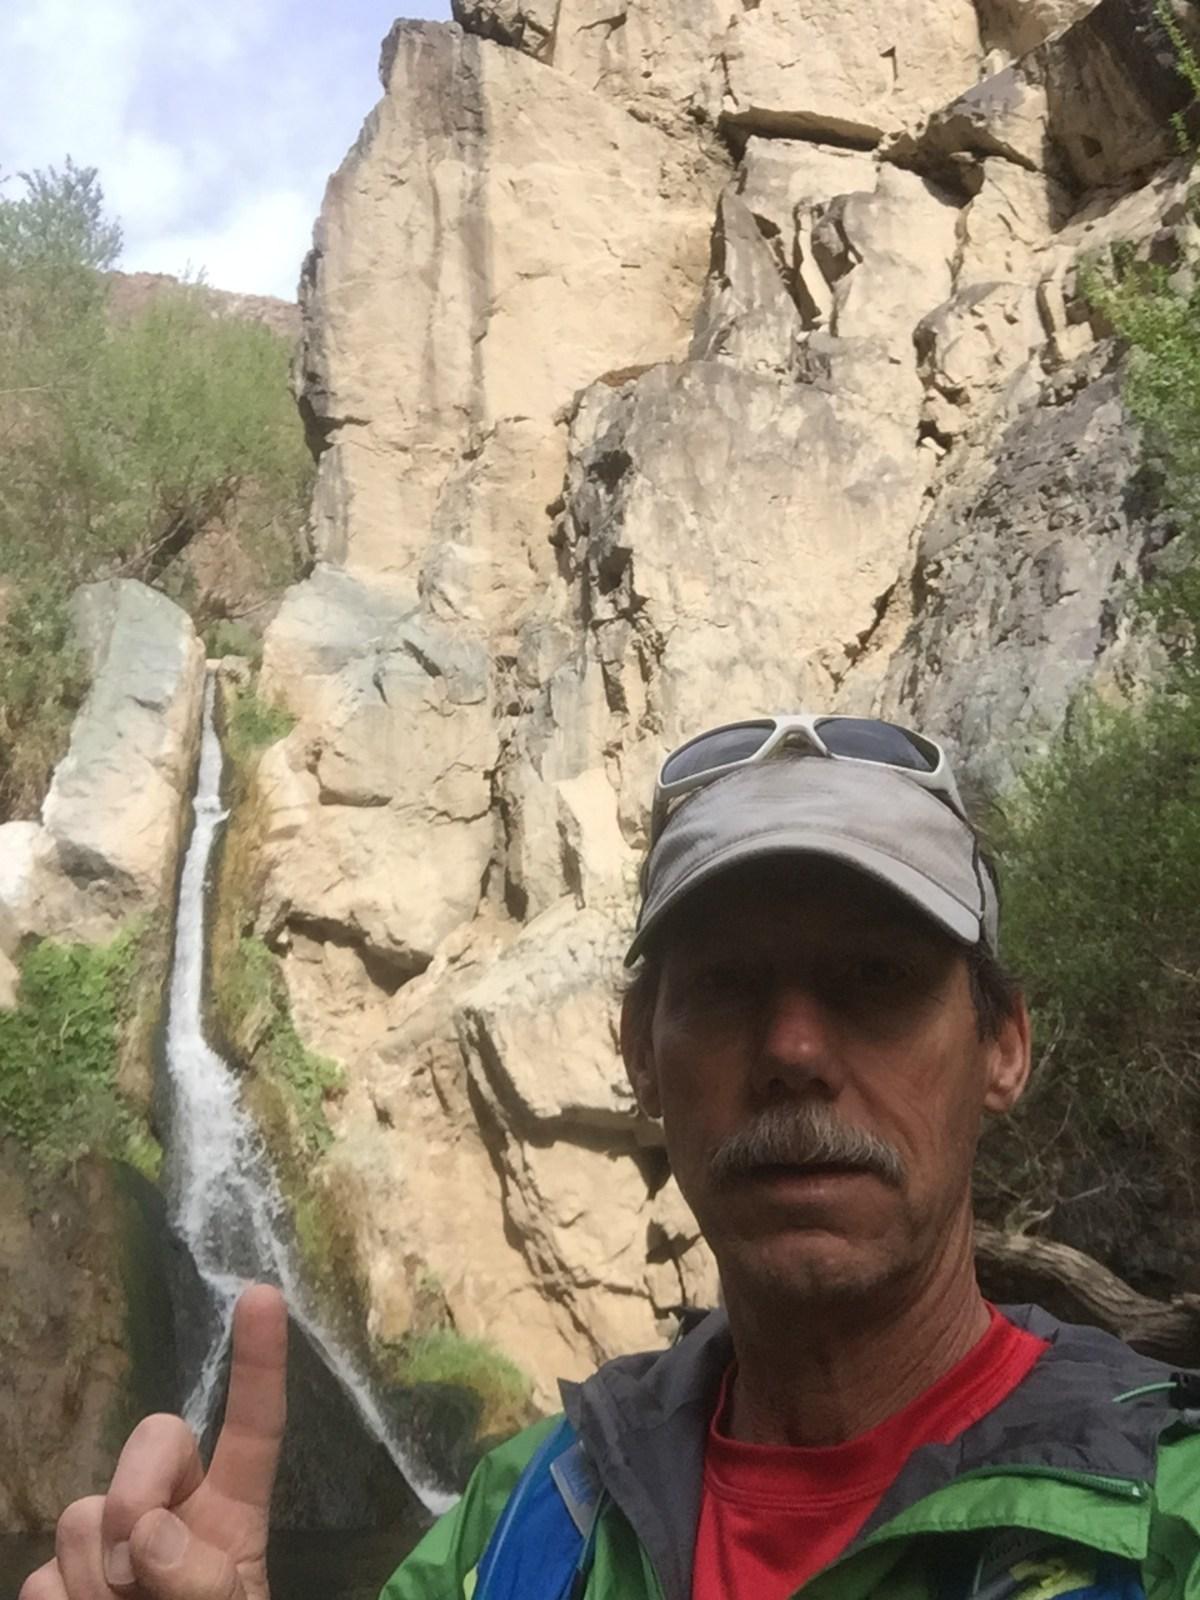 Selfie splitting waterfall with finger.